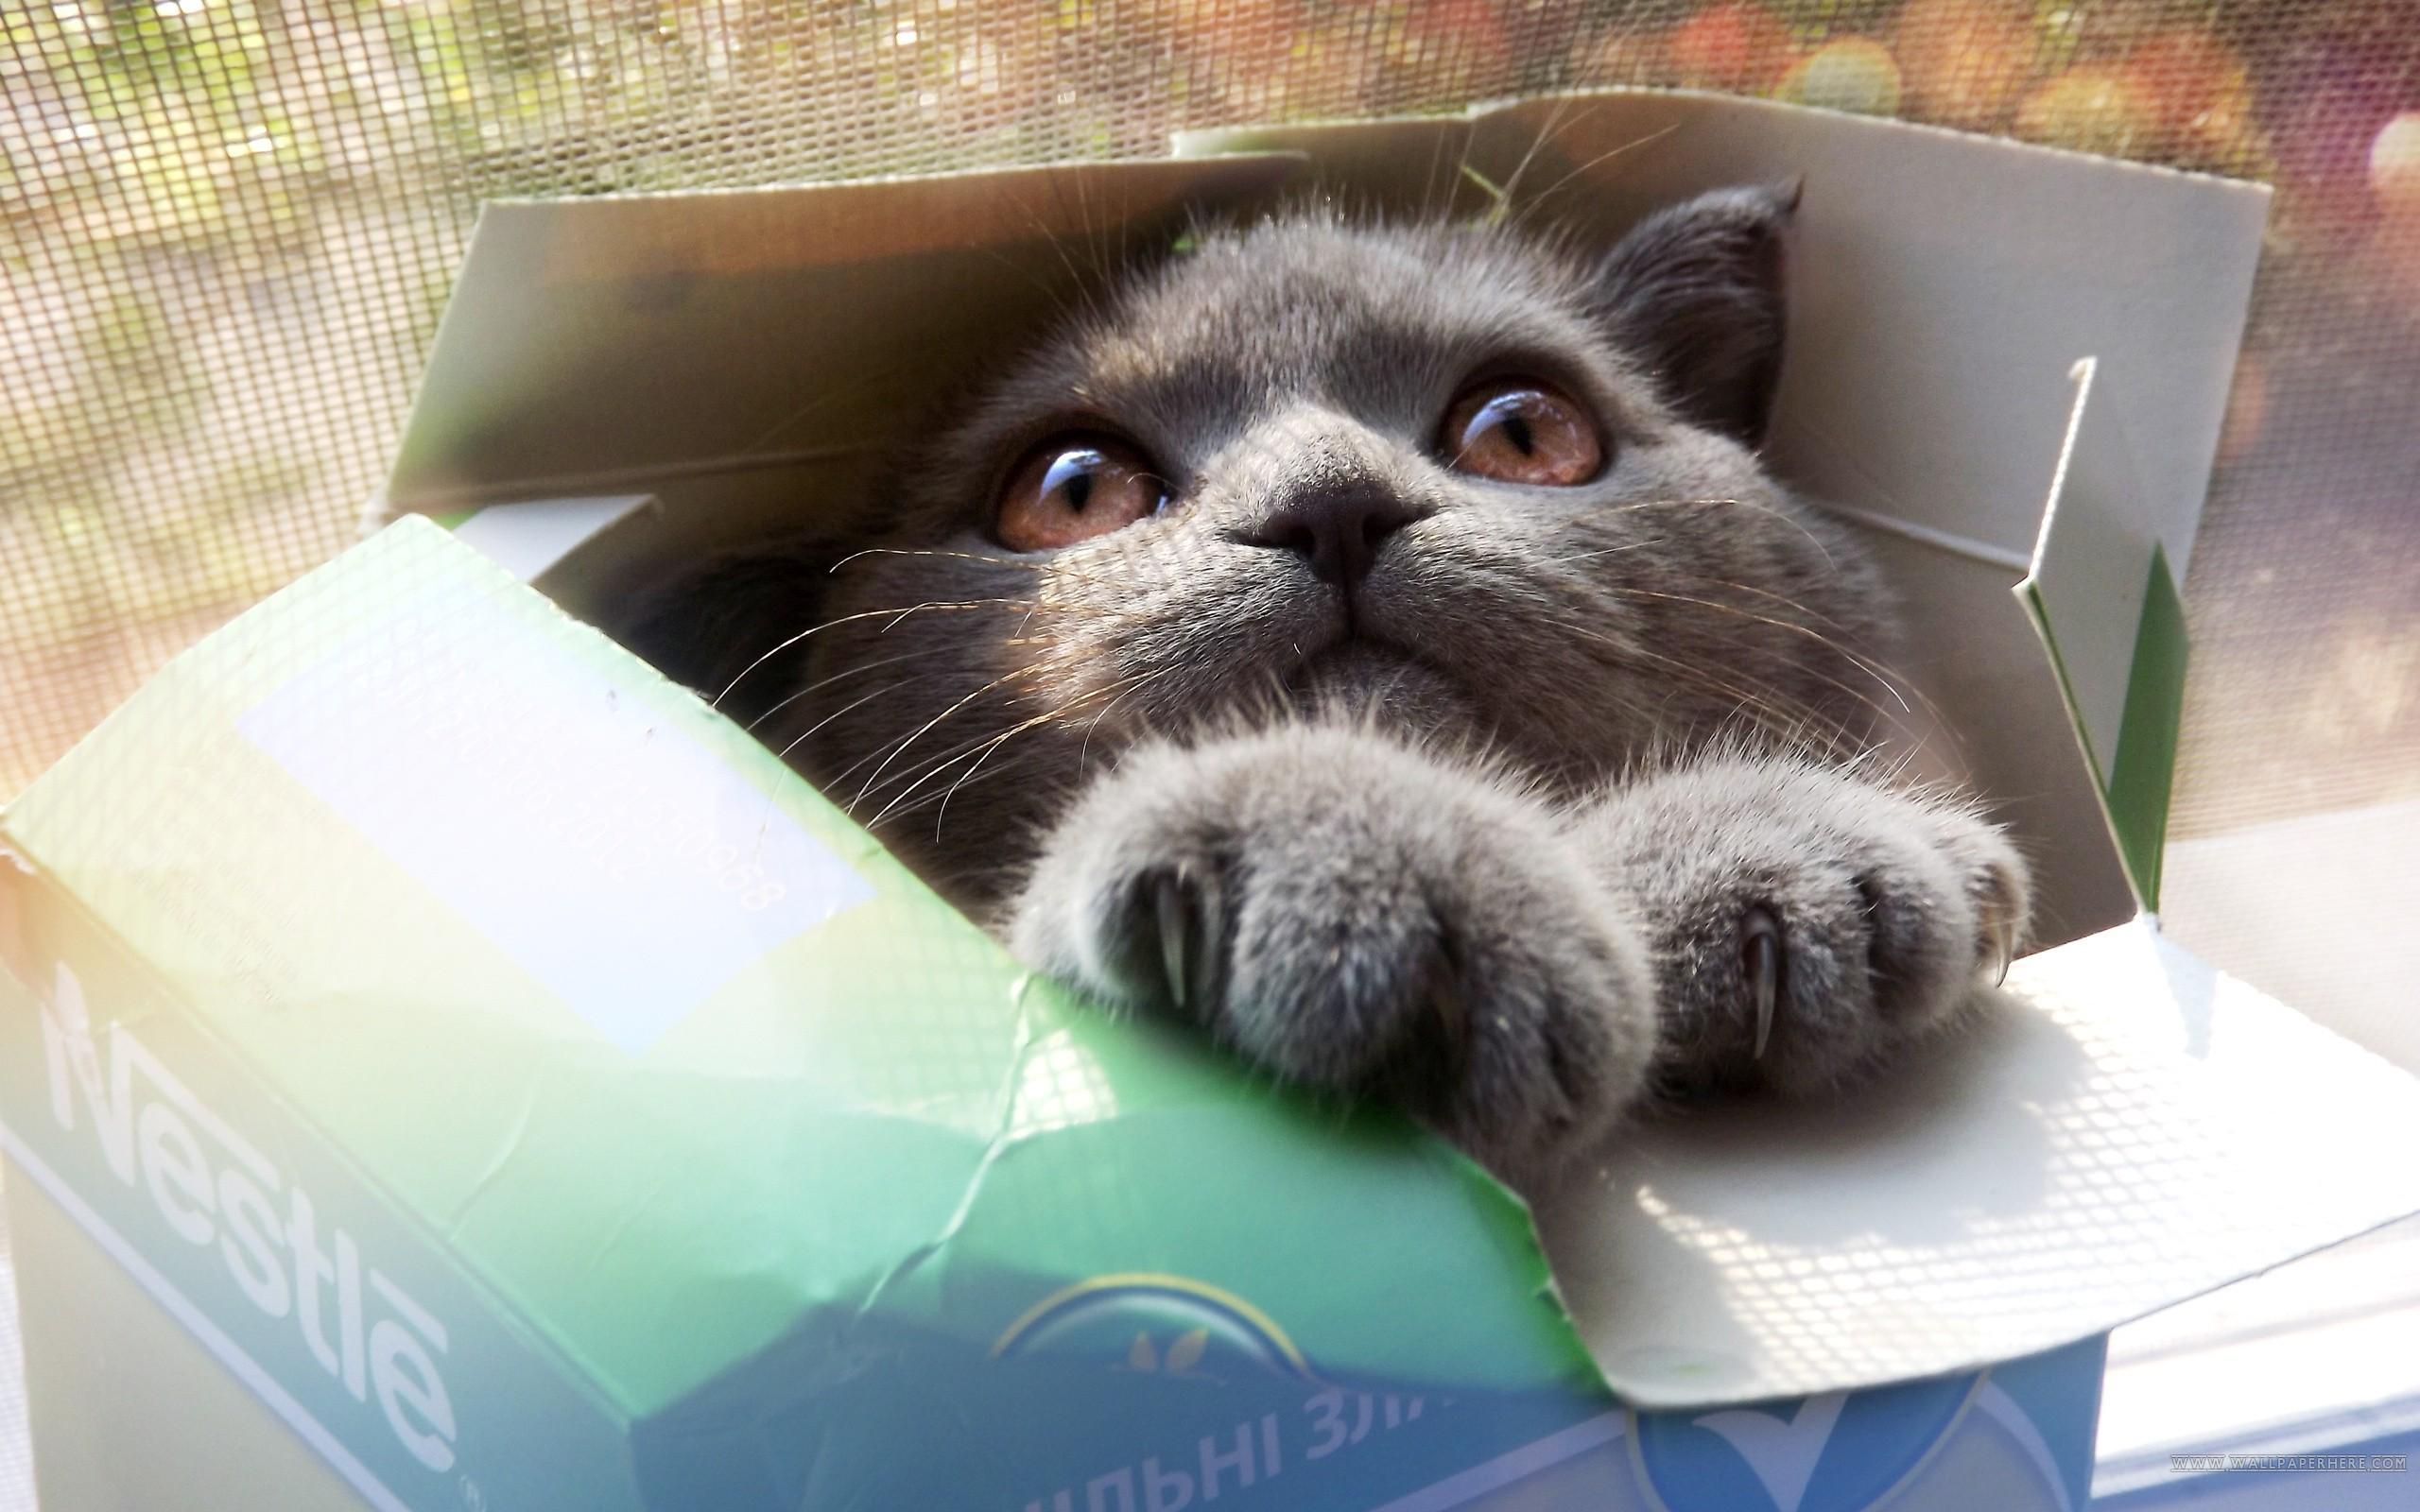 http://www.zastavki.com/pictures/originals/2013/Animals___Cats_Cat_in_a_box_041766_.jpg